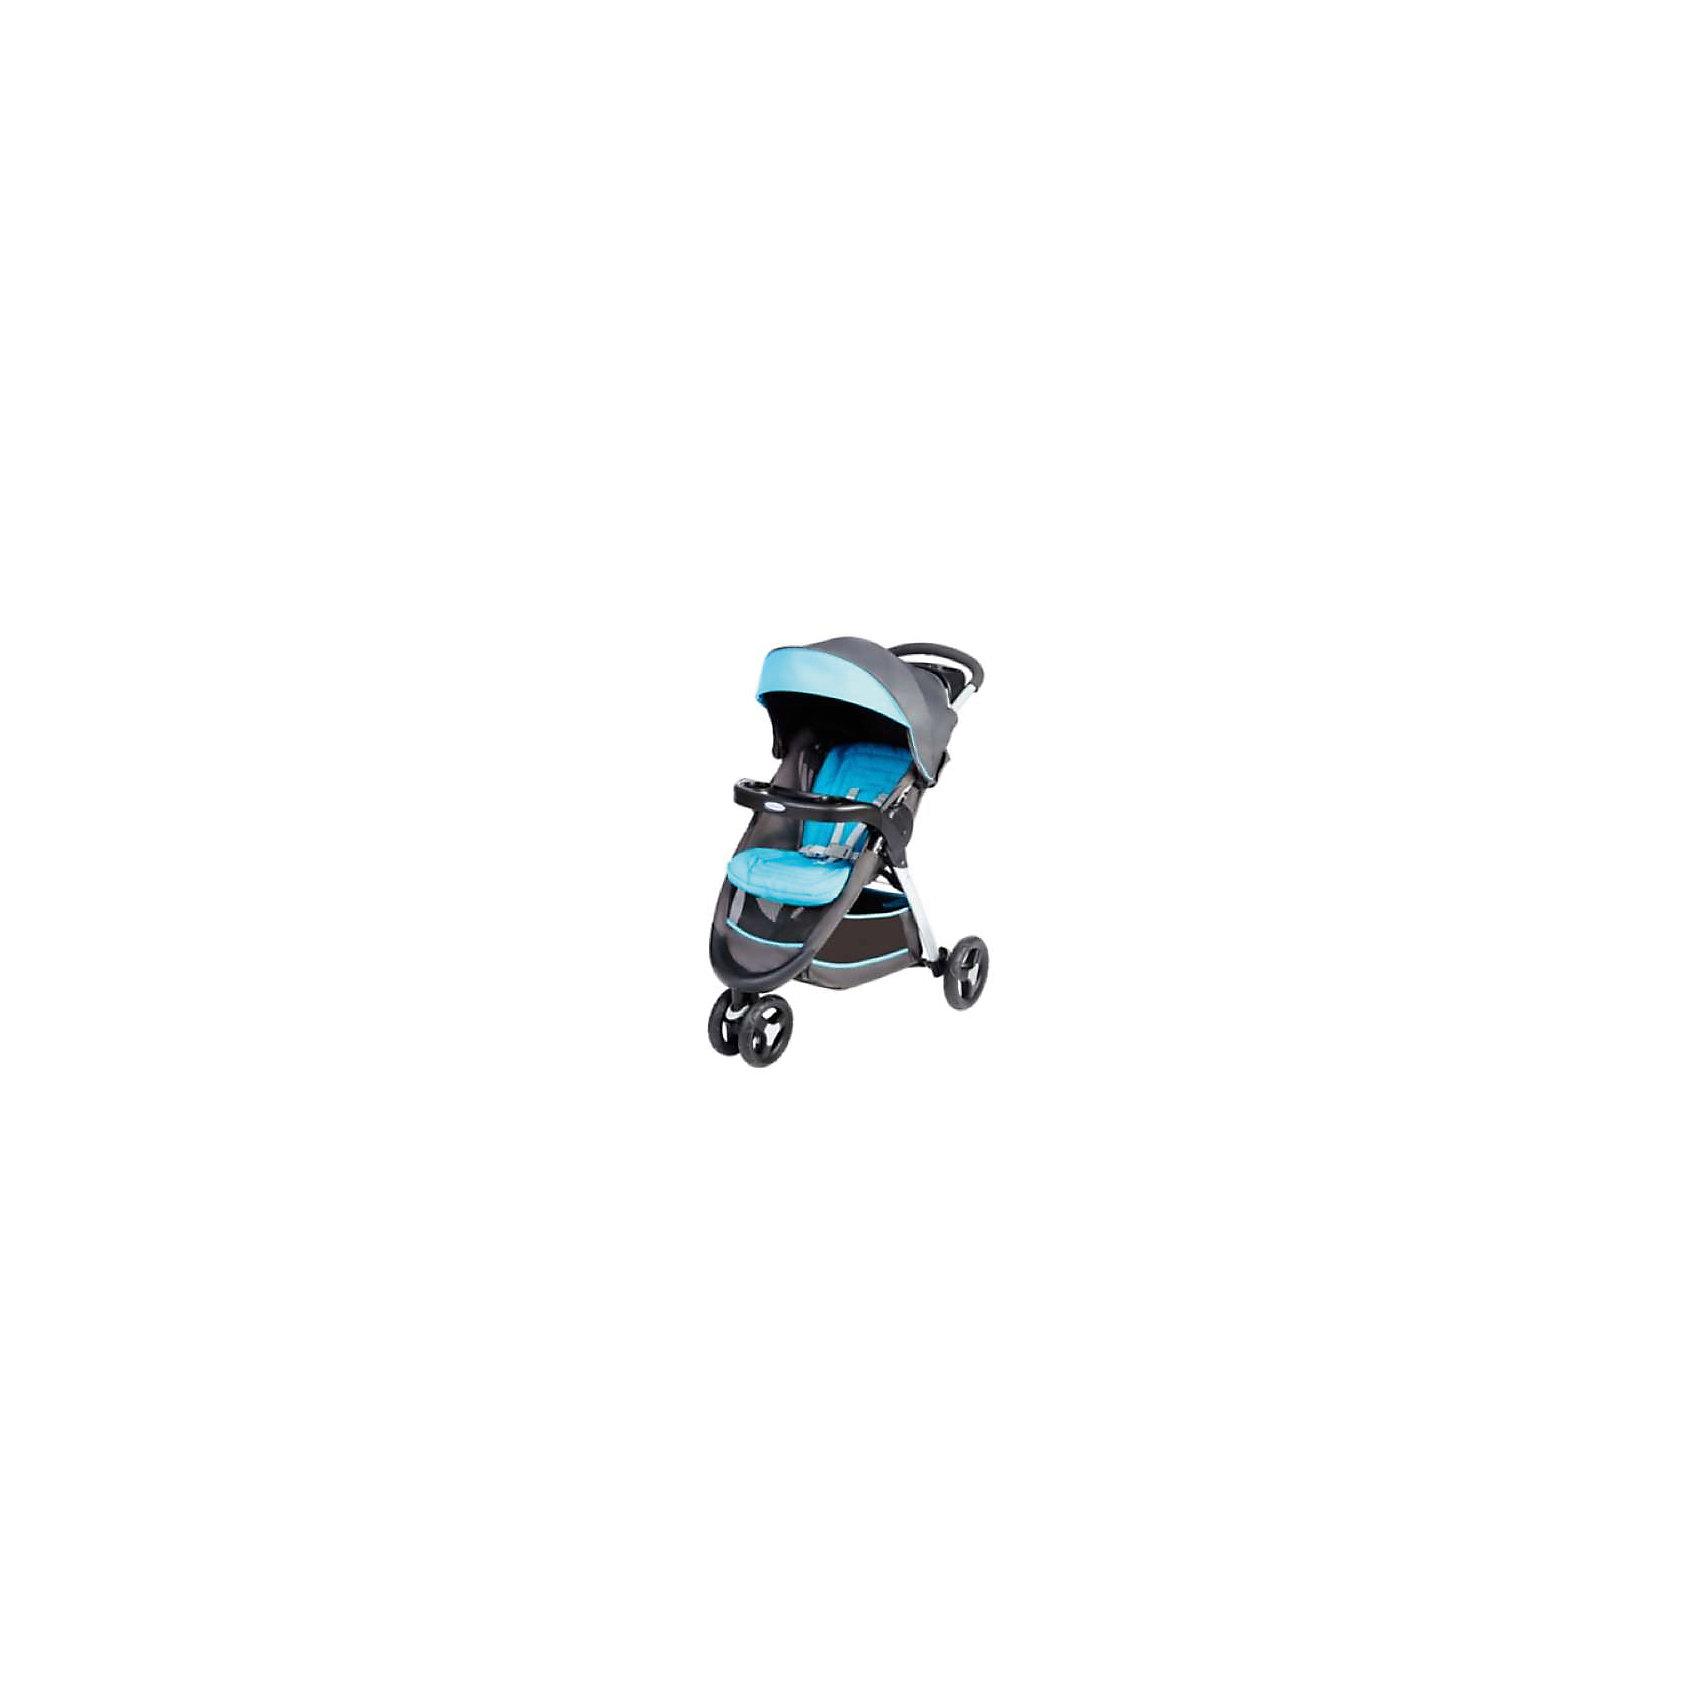 Graco Прогулочная коляска Fastaction Fold, Graco, серый-голубой graco